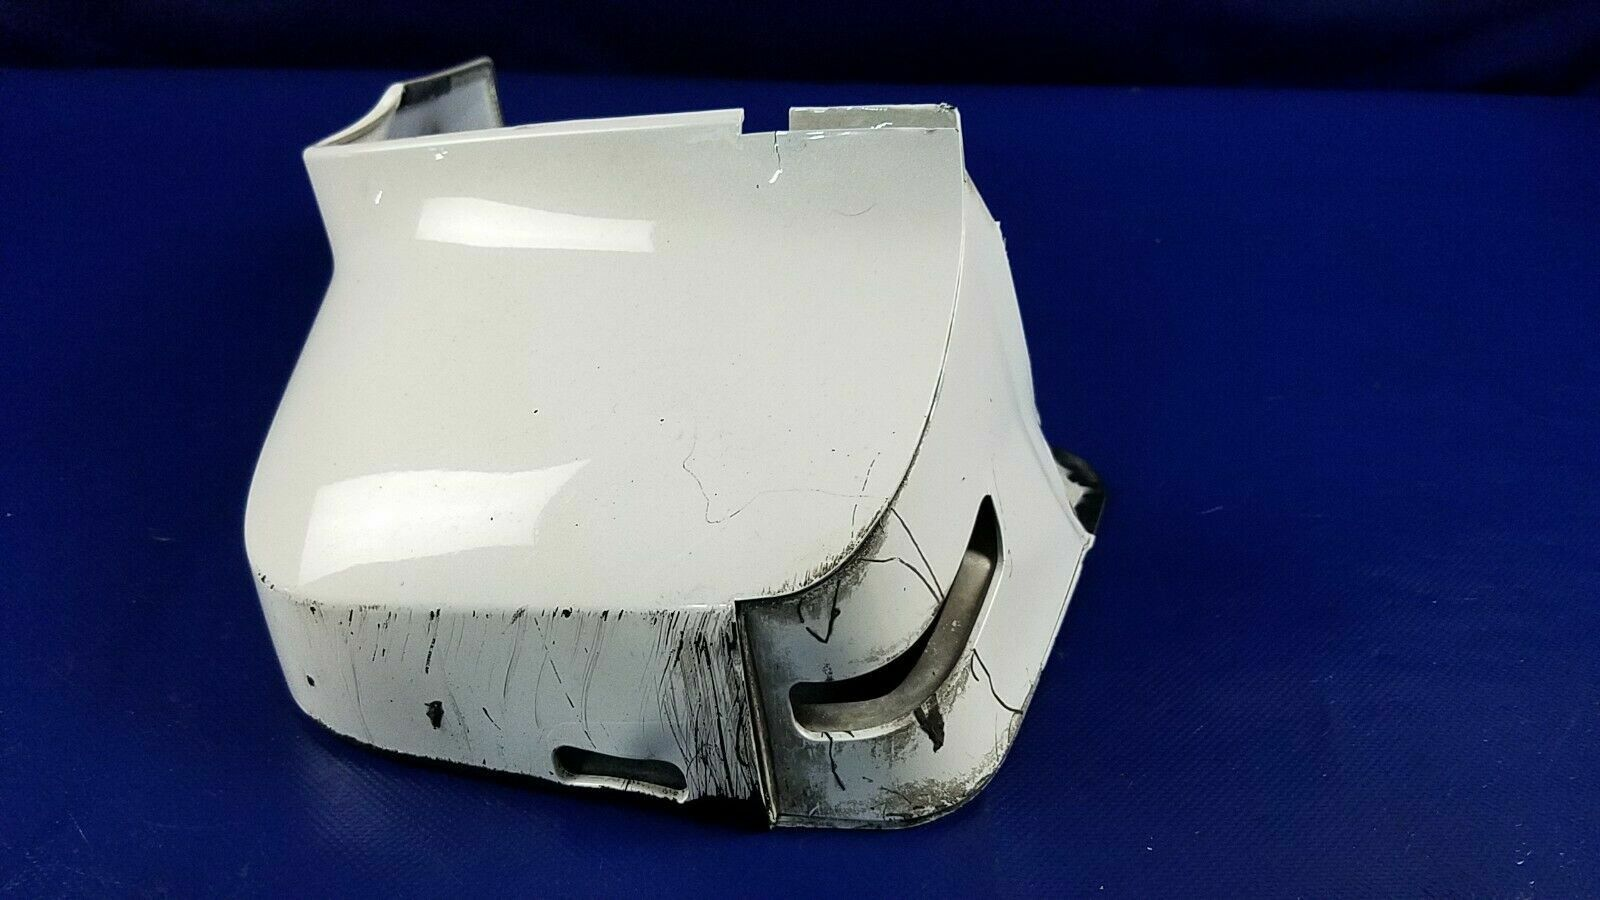 13-14 INFINITI JX35 QX60 FRONT LEFT SIDE MUD SPLASH FLAP GUARD WHITE (QAA) 69310